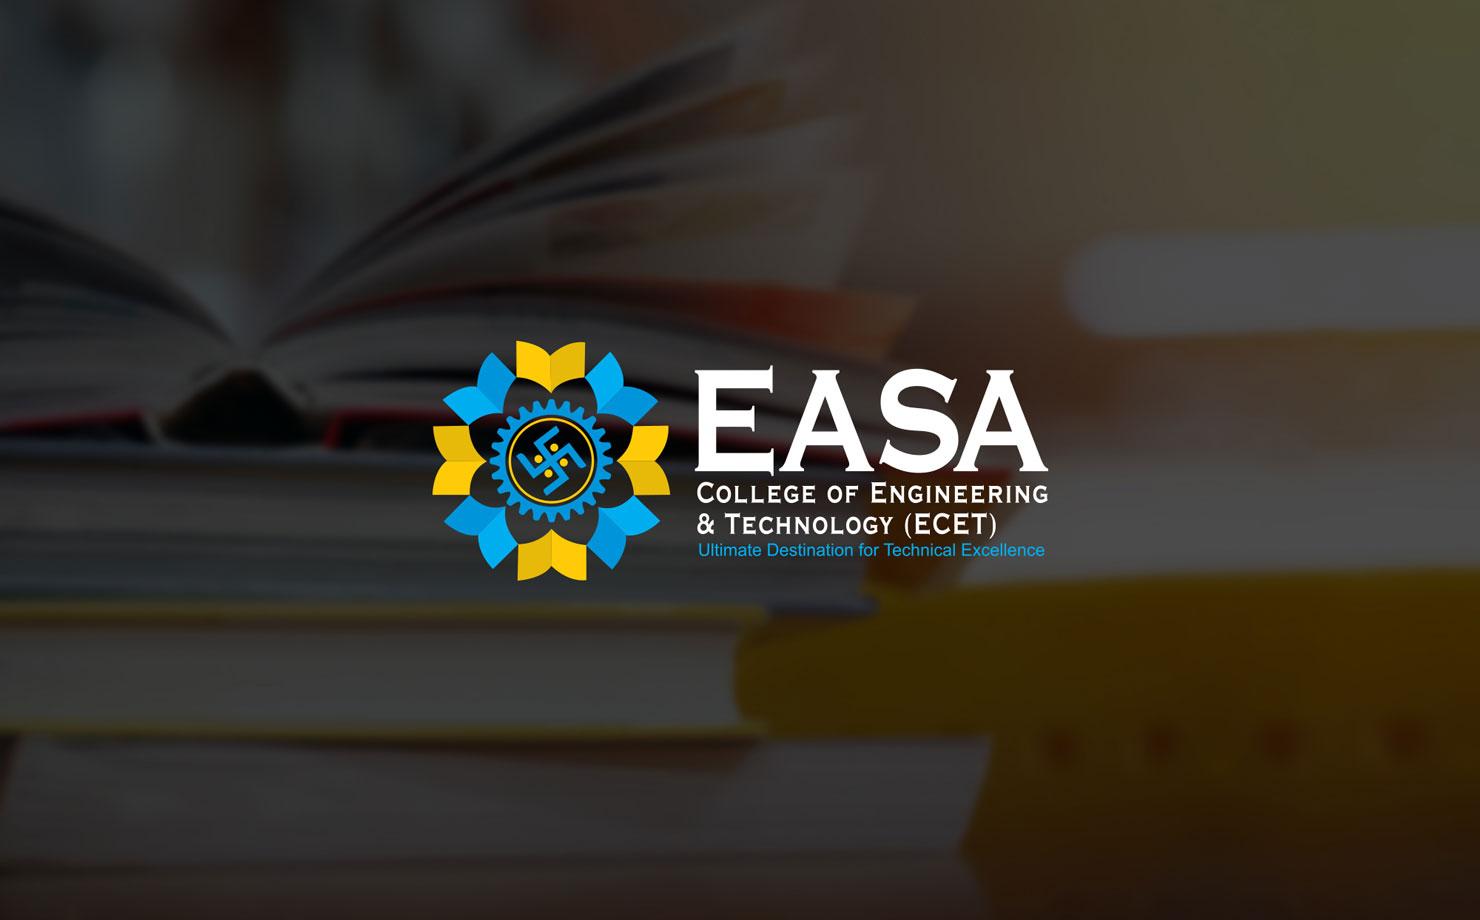 easa1